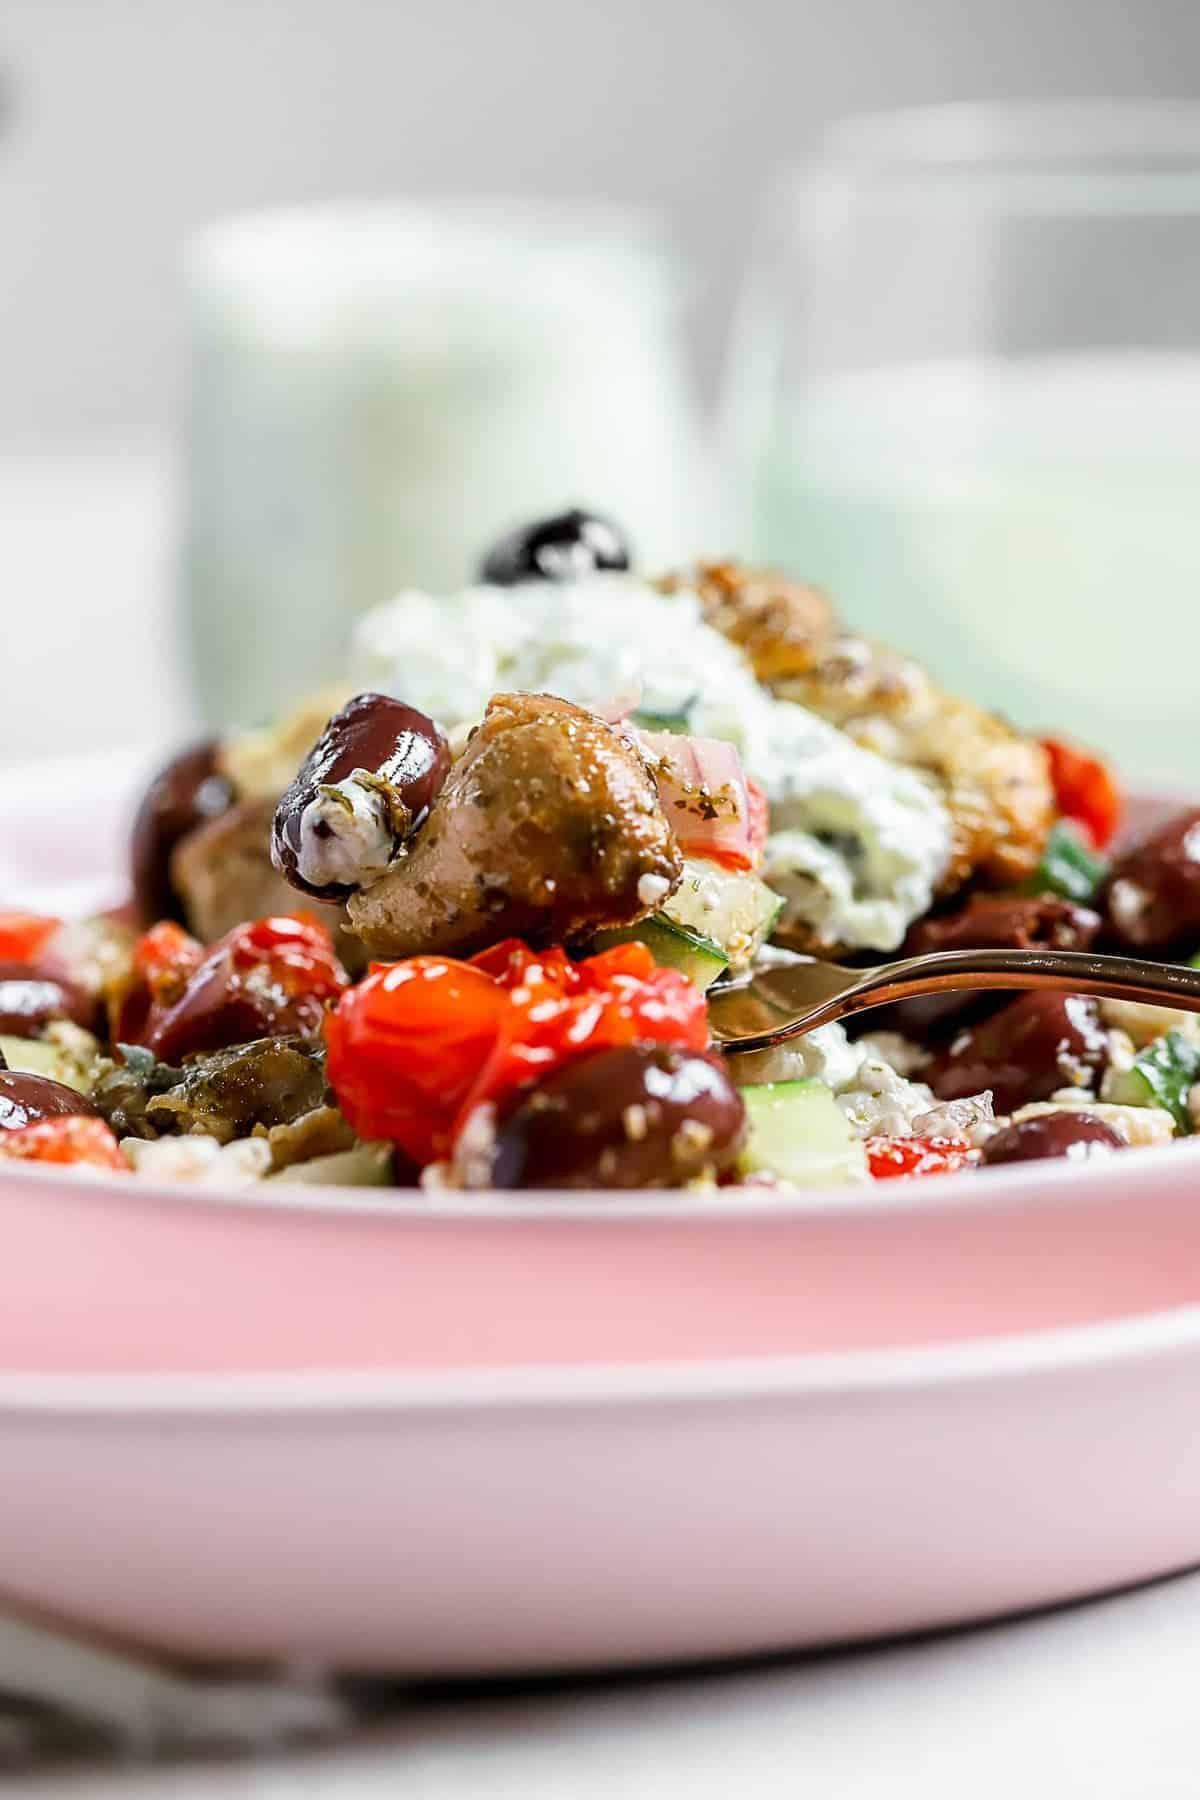 A greek chicken skillet meal in a light pink bowl